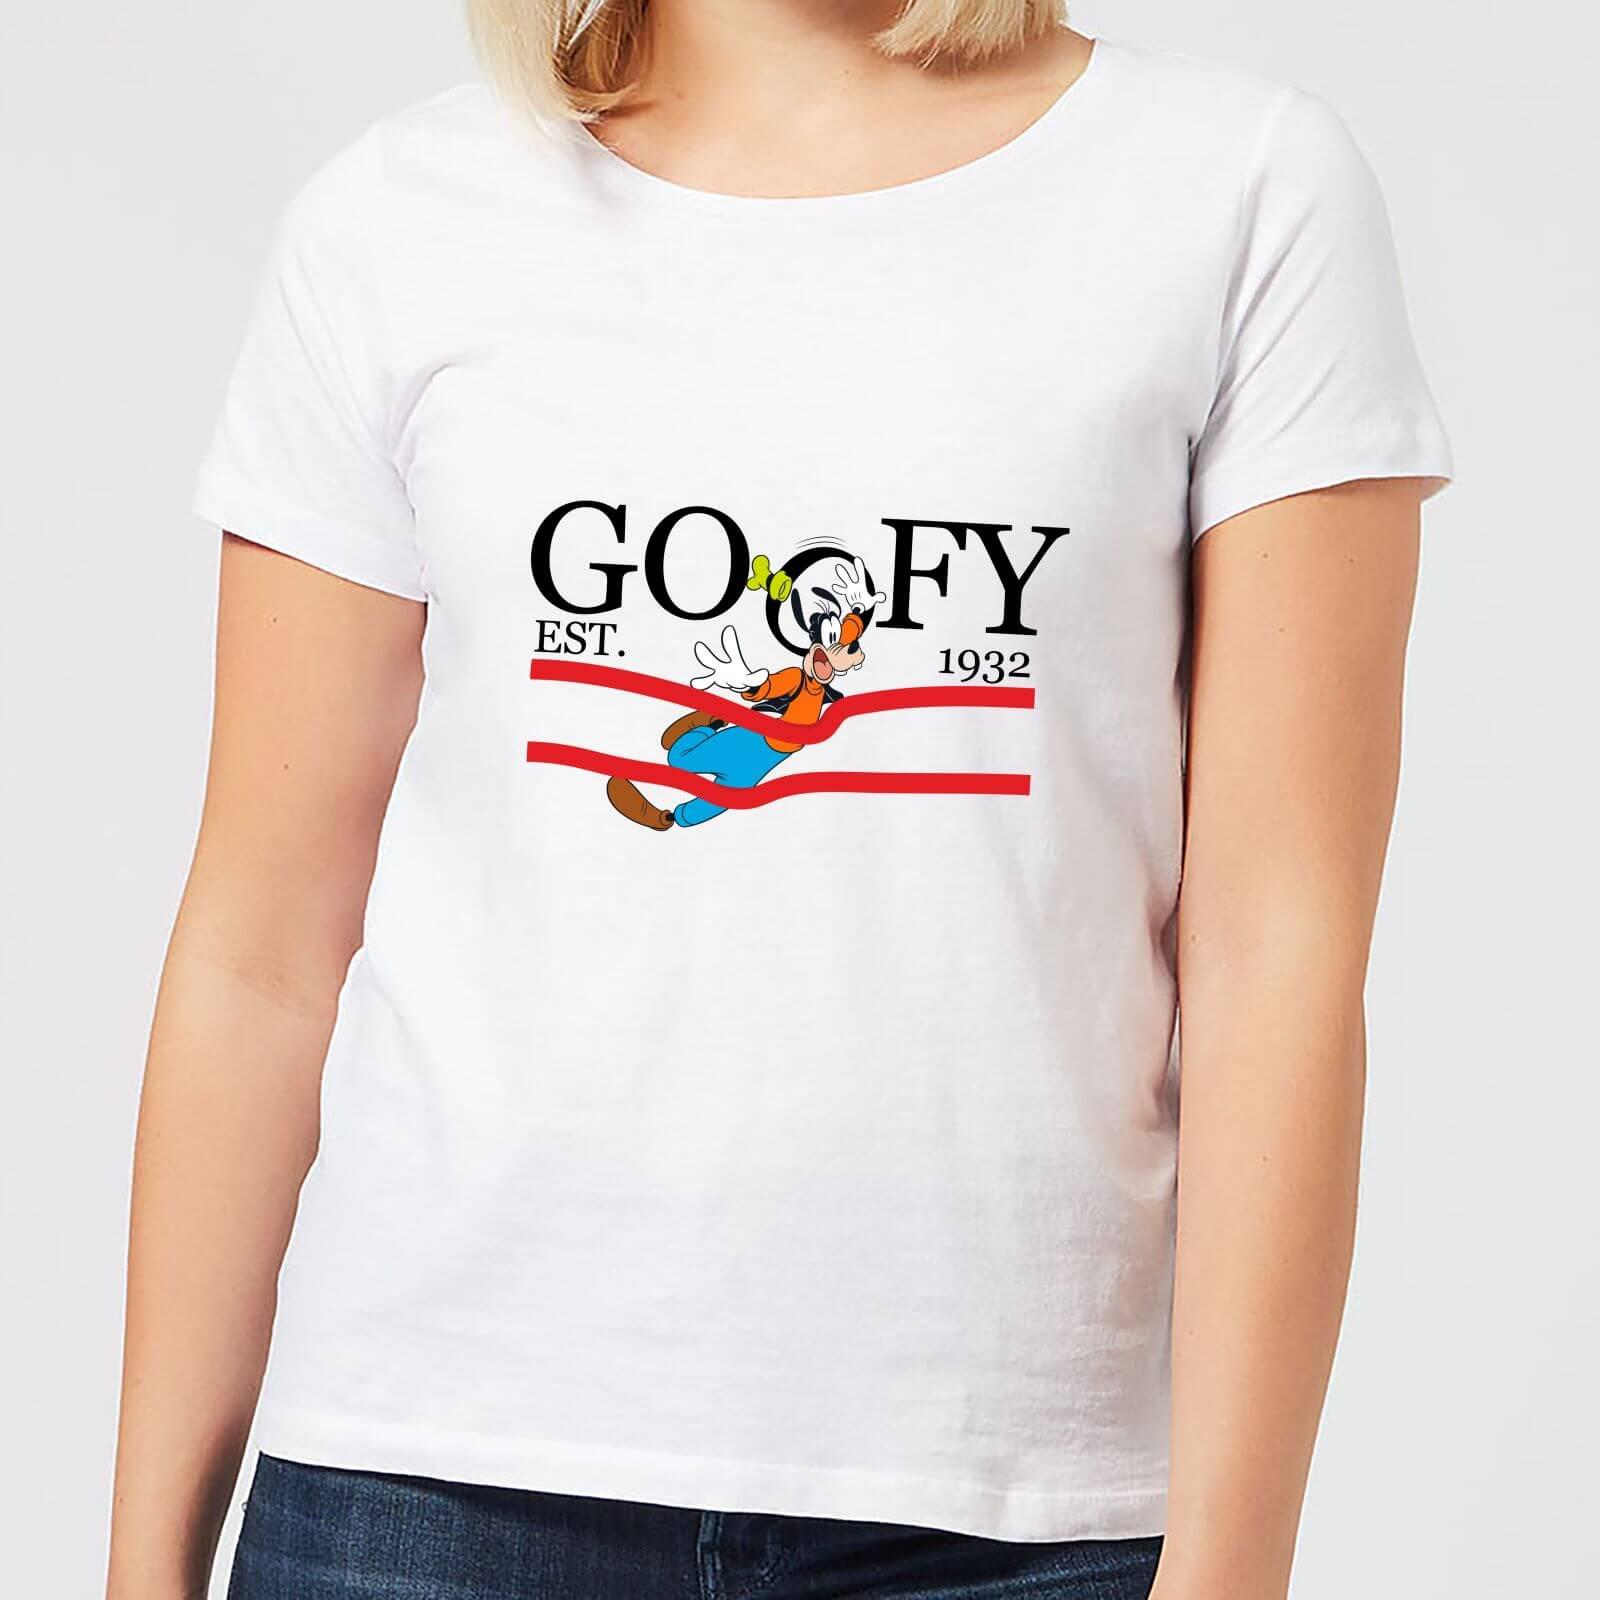 Disney Disney Goofy By Nature Women's T-Shirt - White - 5XL - White